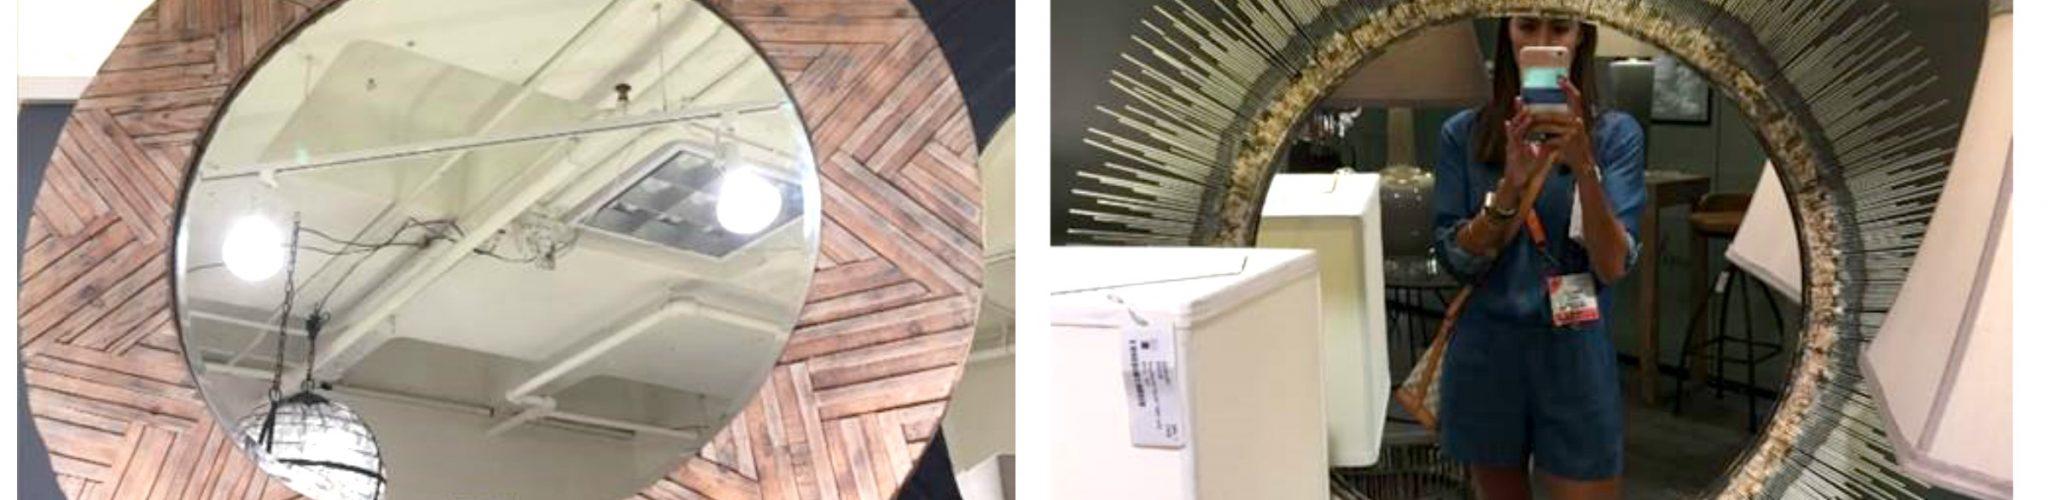 Mirror Collage 2